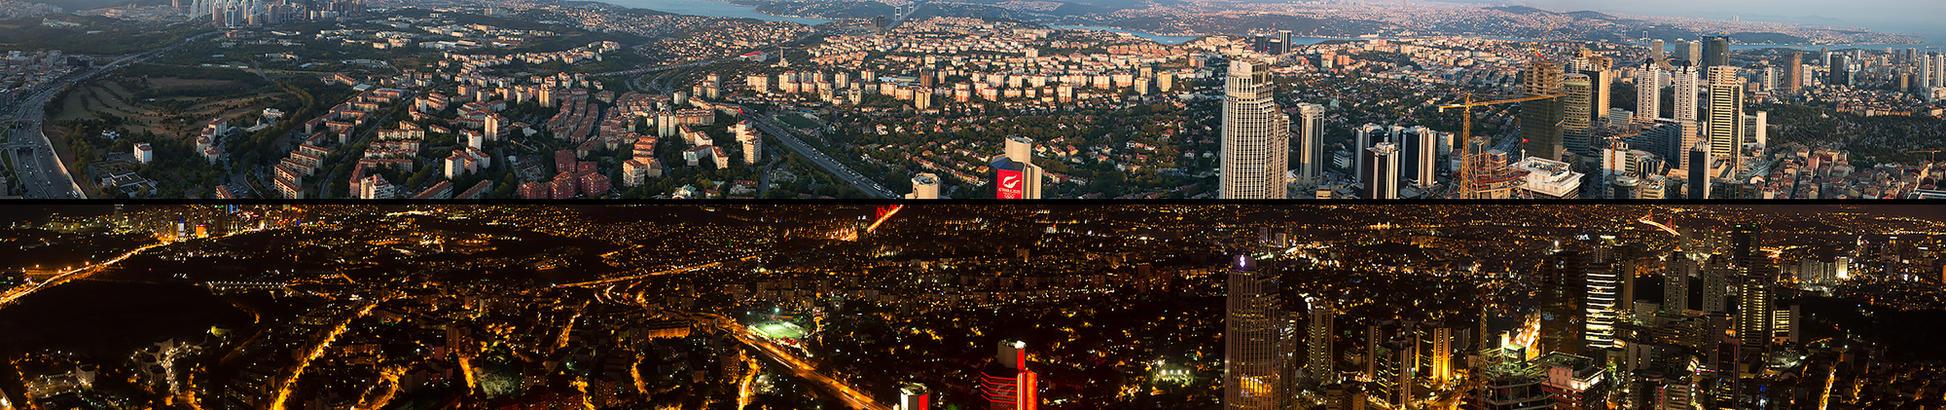 istanbul day / night by gokcentunc